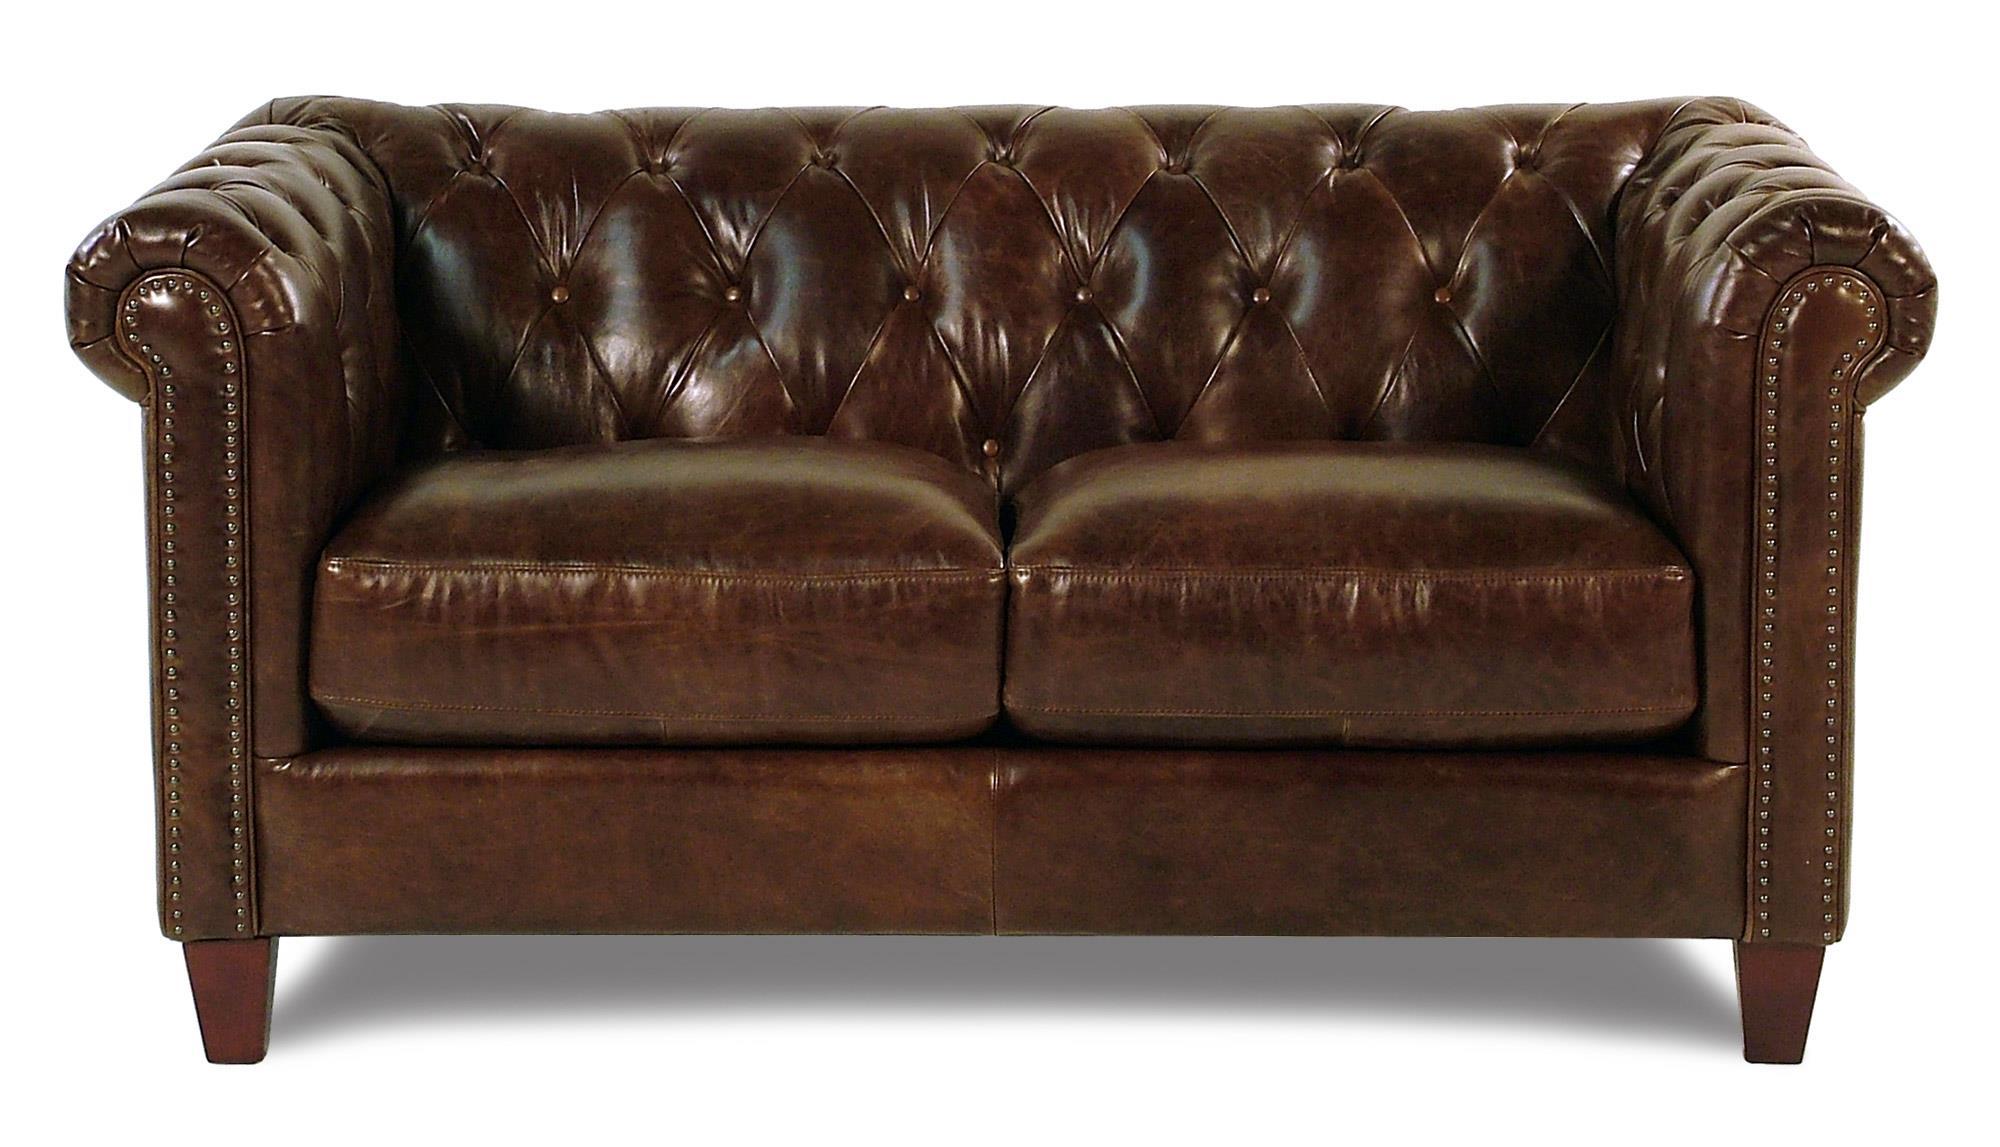 Loft Leather Carrington Tufted Leather Loveseat - Item Number: 8687-20